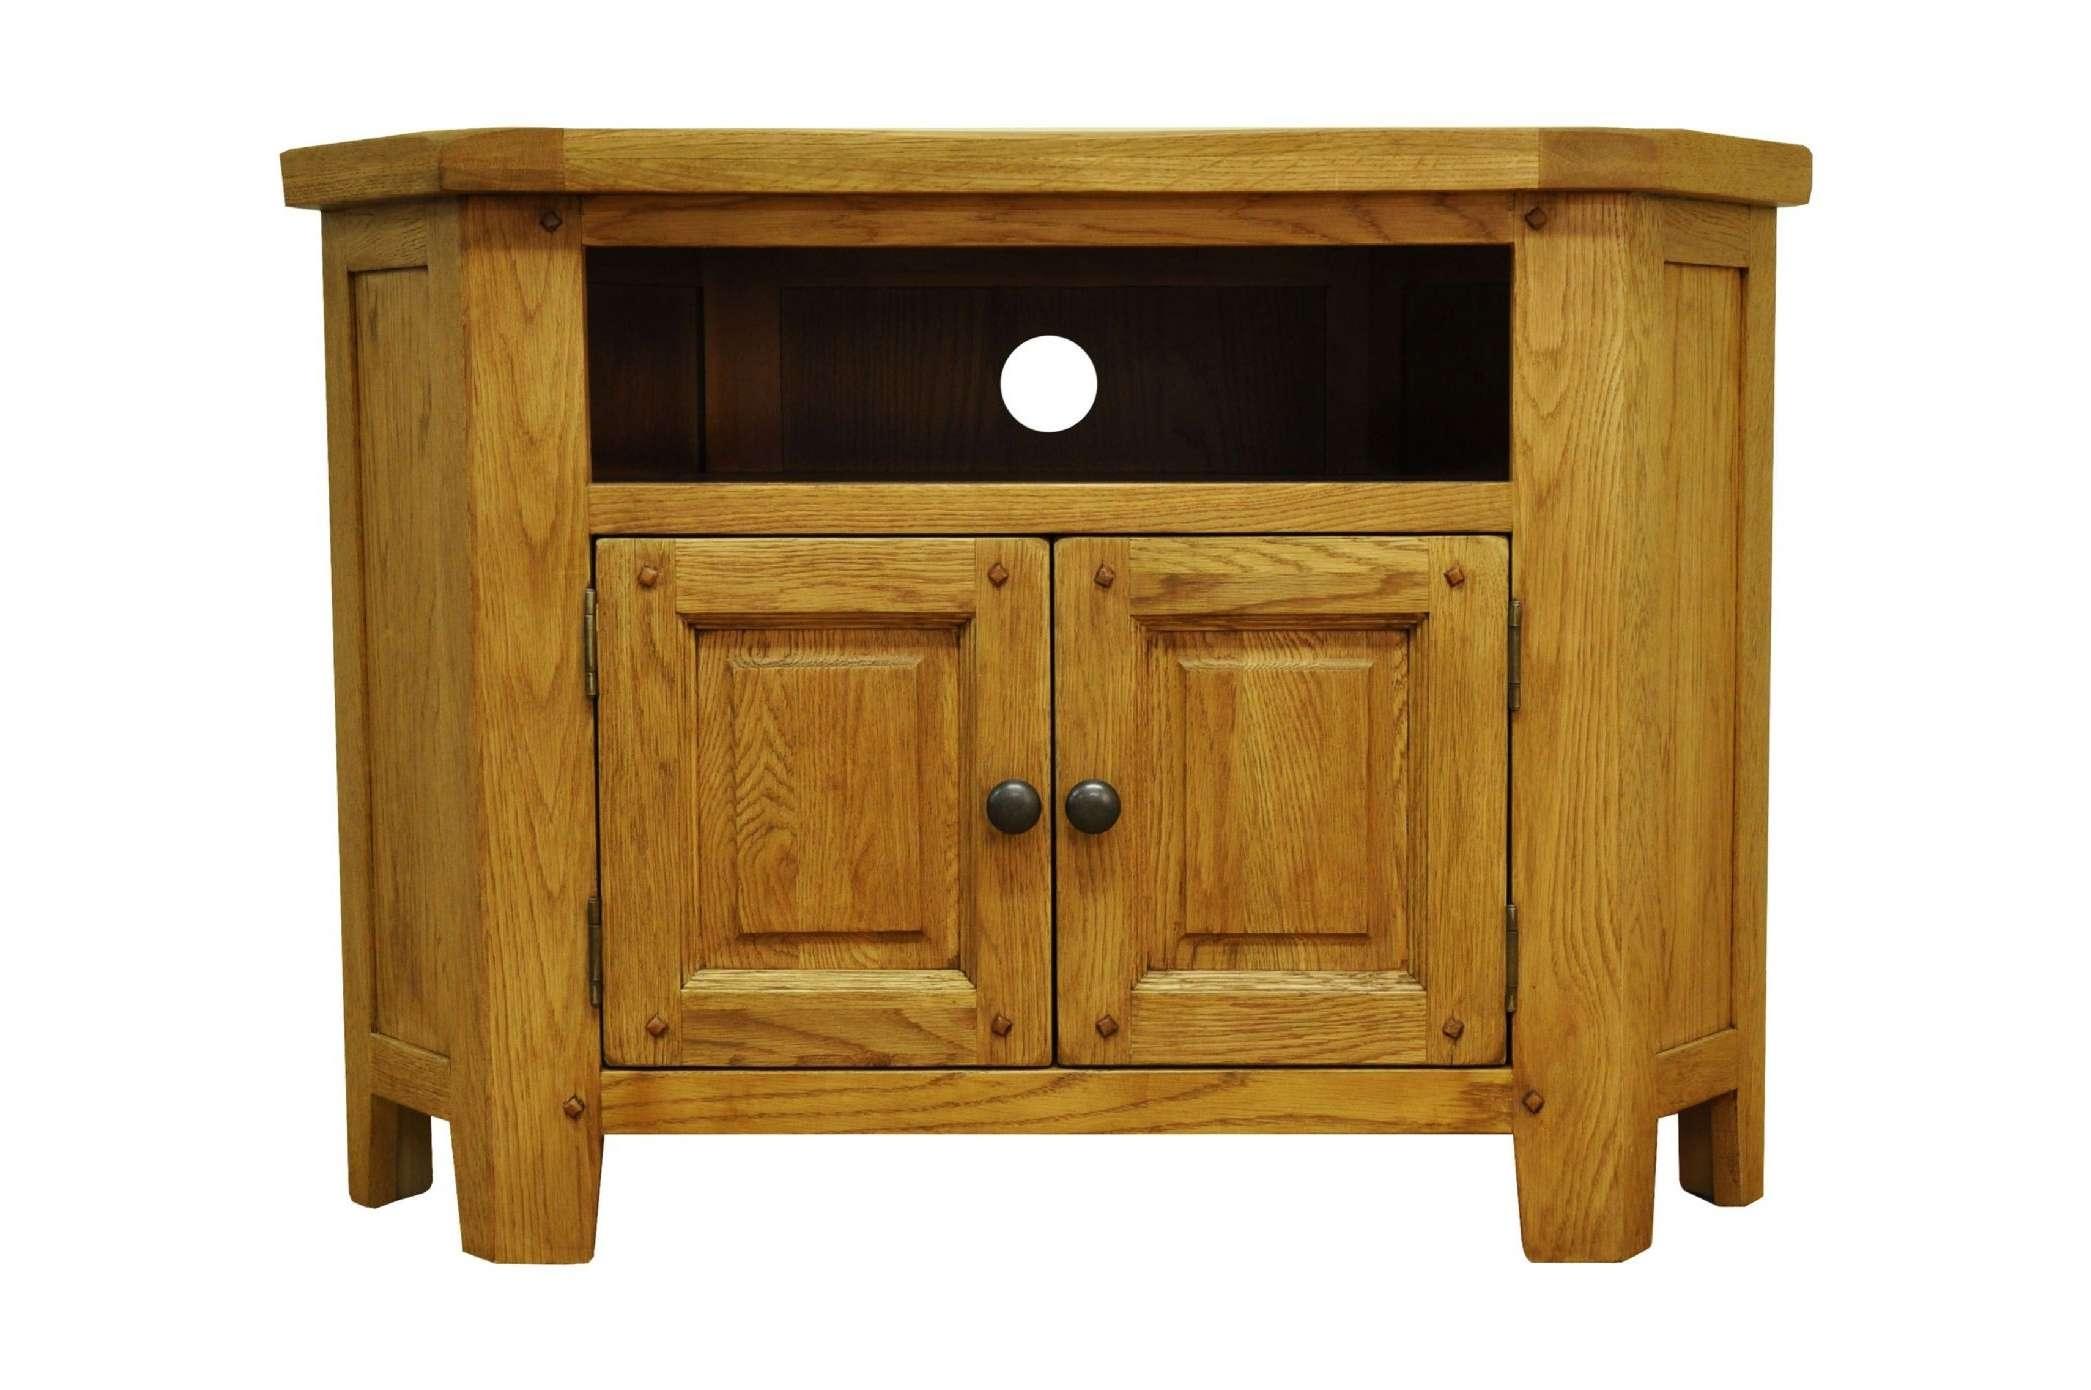 Stratford Rustic Oak Living Corner Tv Unit Cabinet Strat Ctv With Regard To Rustic Corner Tv Stands (View 13 of 15)